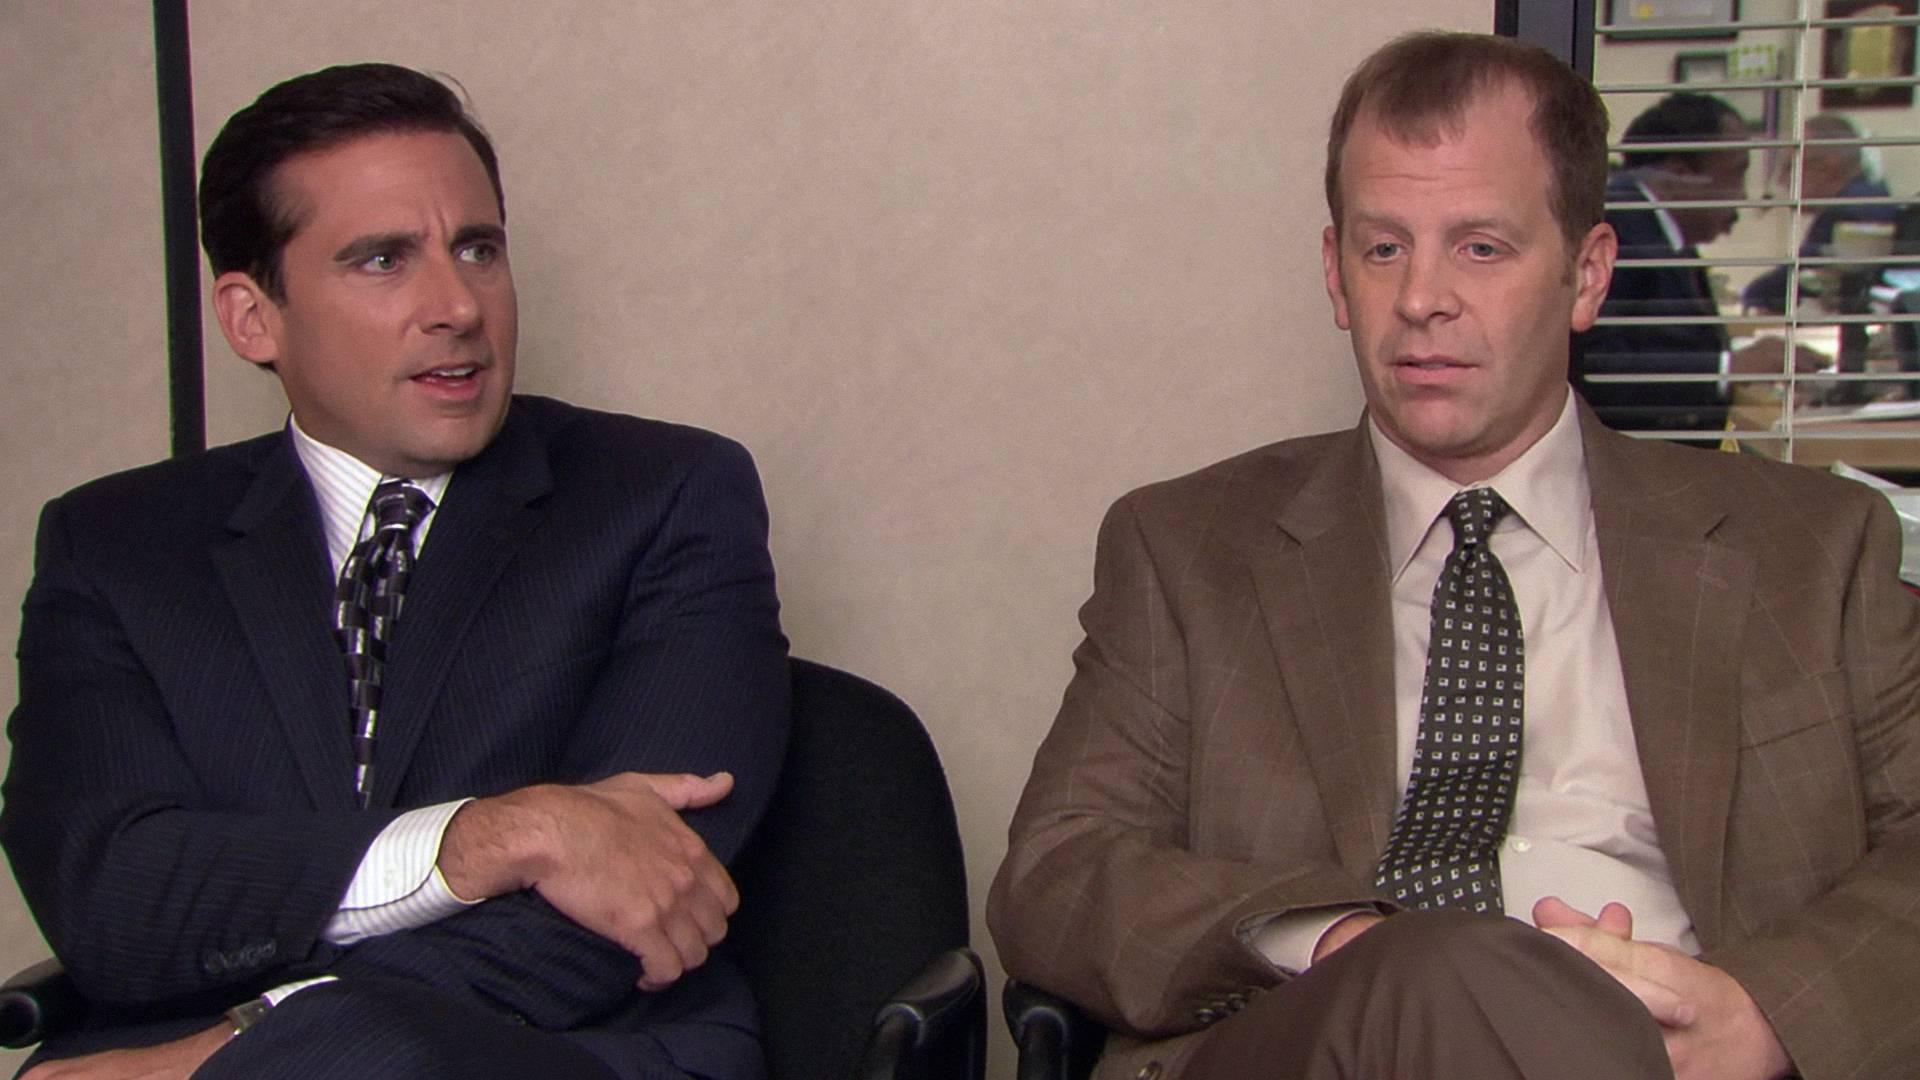 The Office Season 5 Episode 9